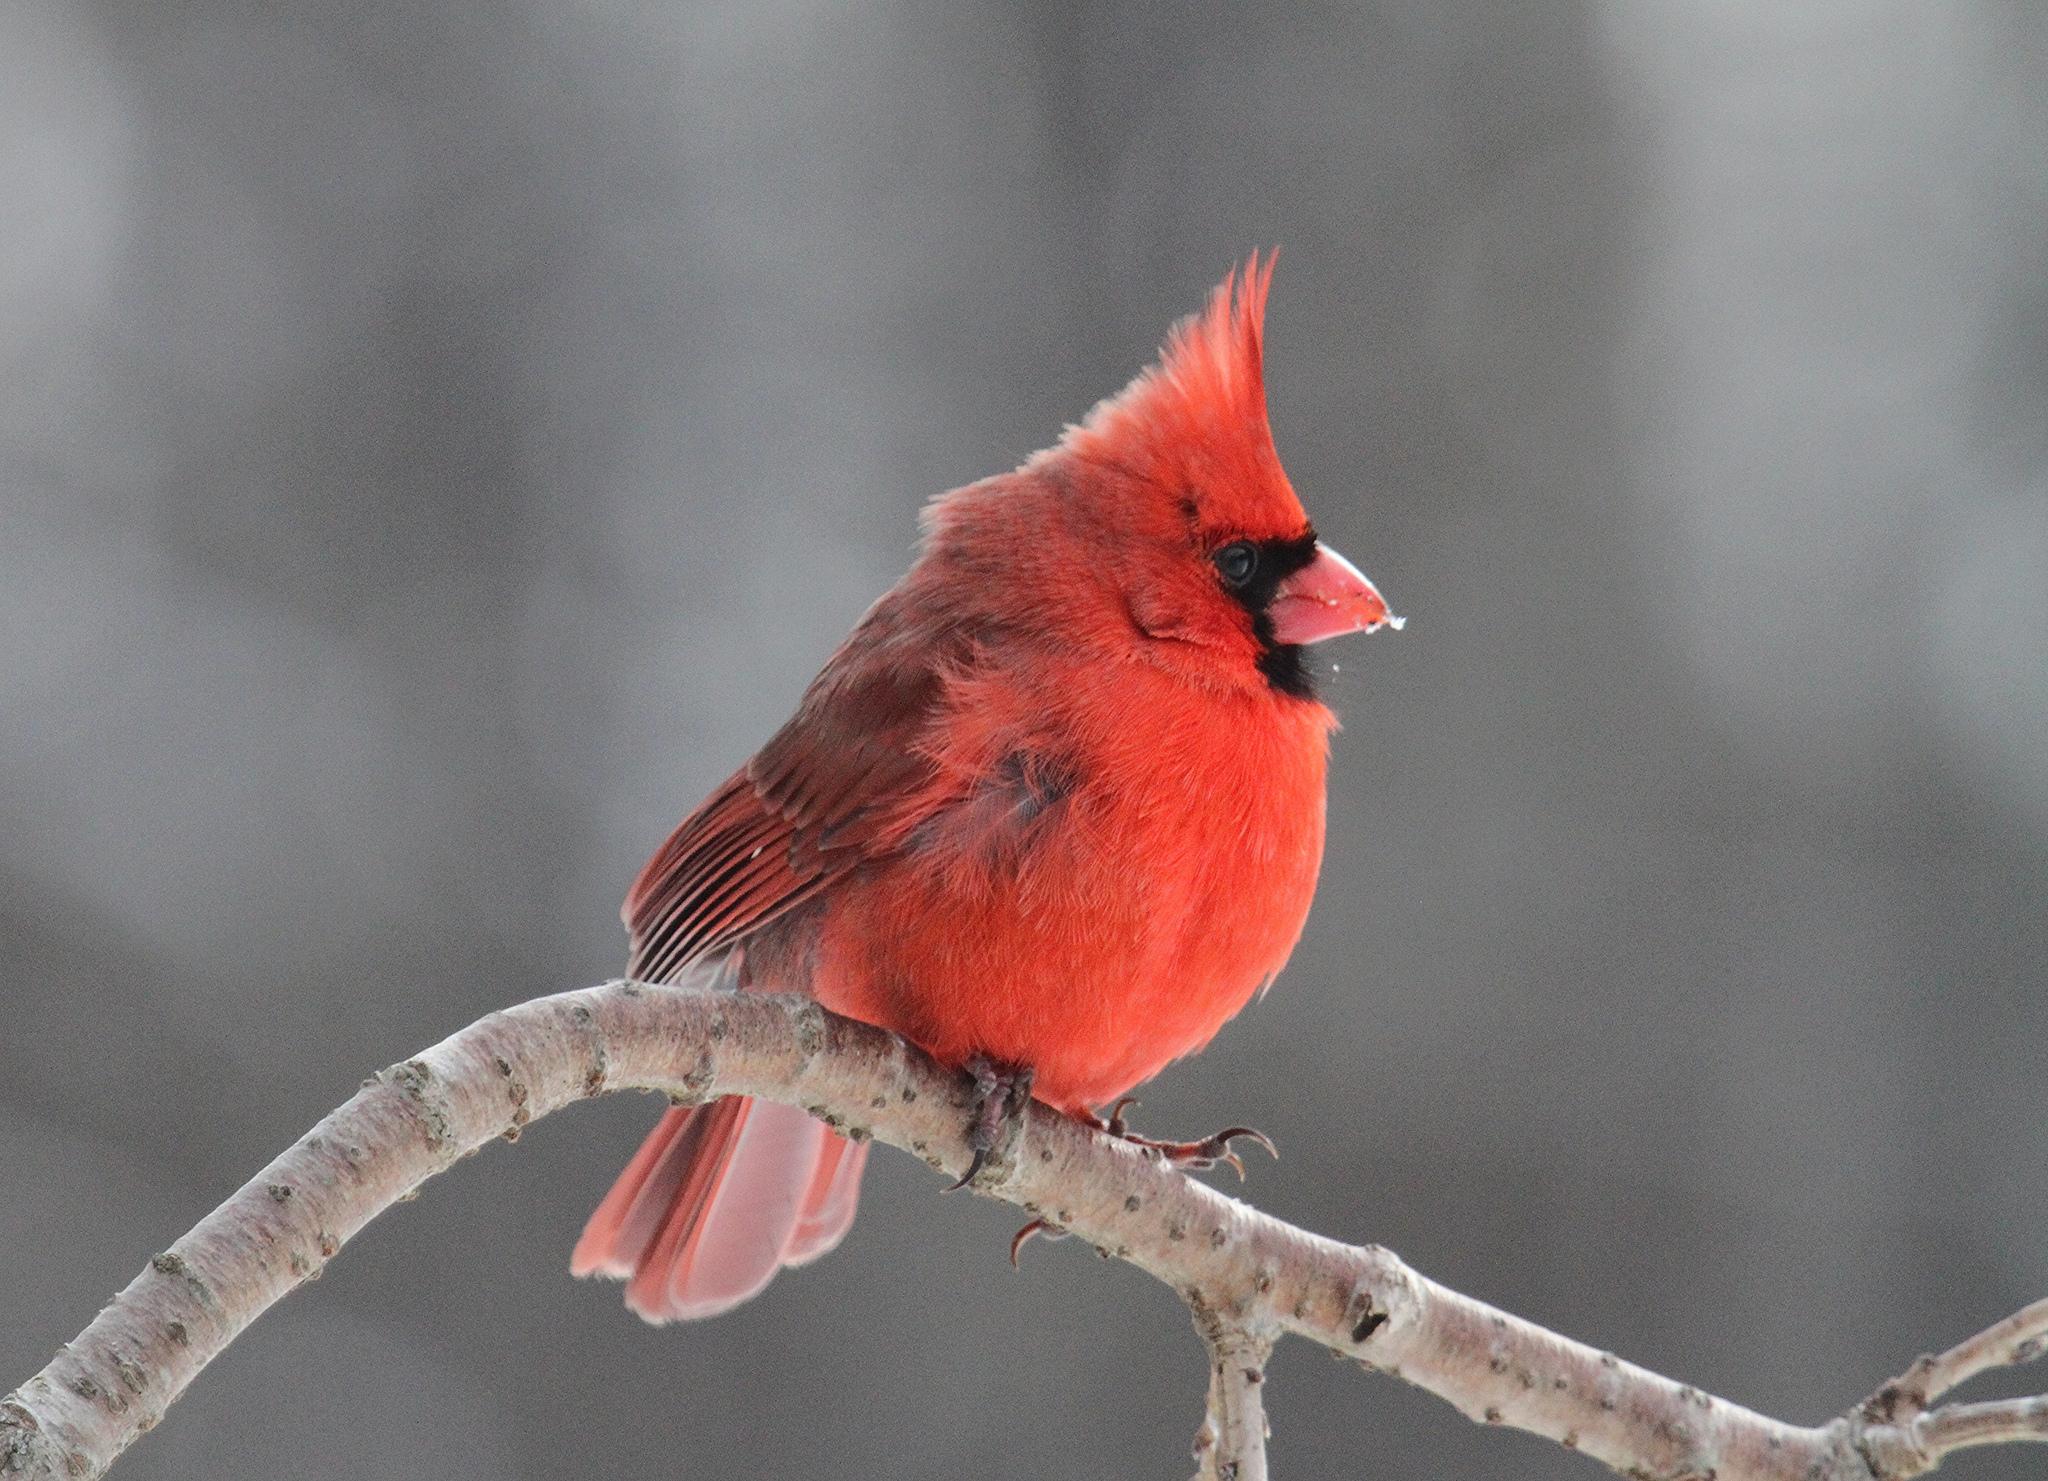 Cardinal | © John Flannery/Flickr